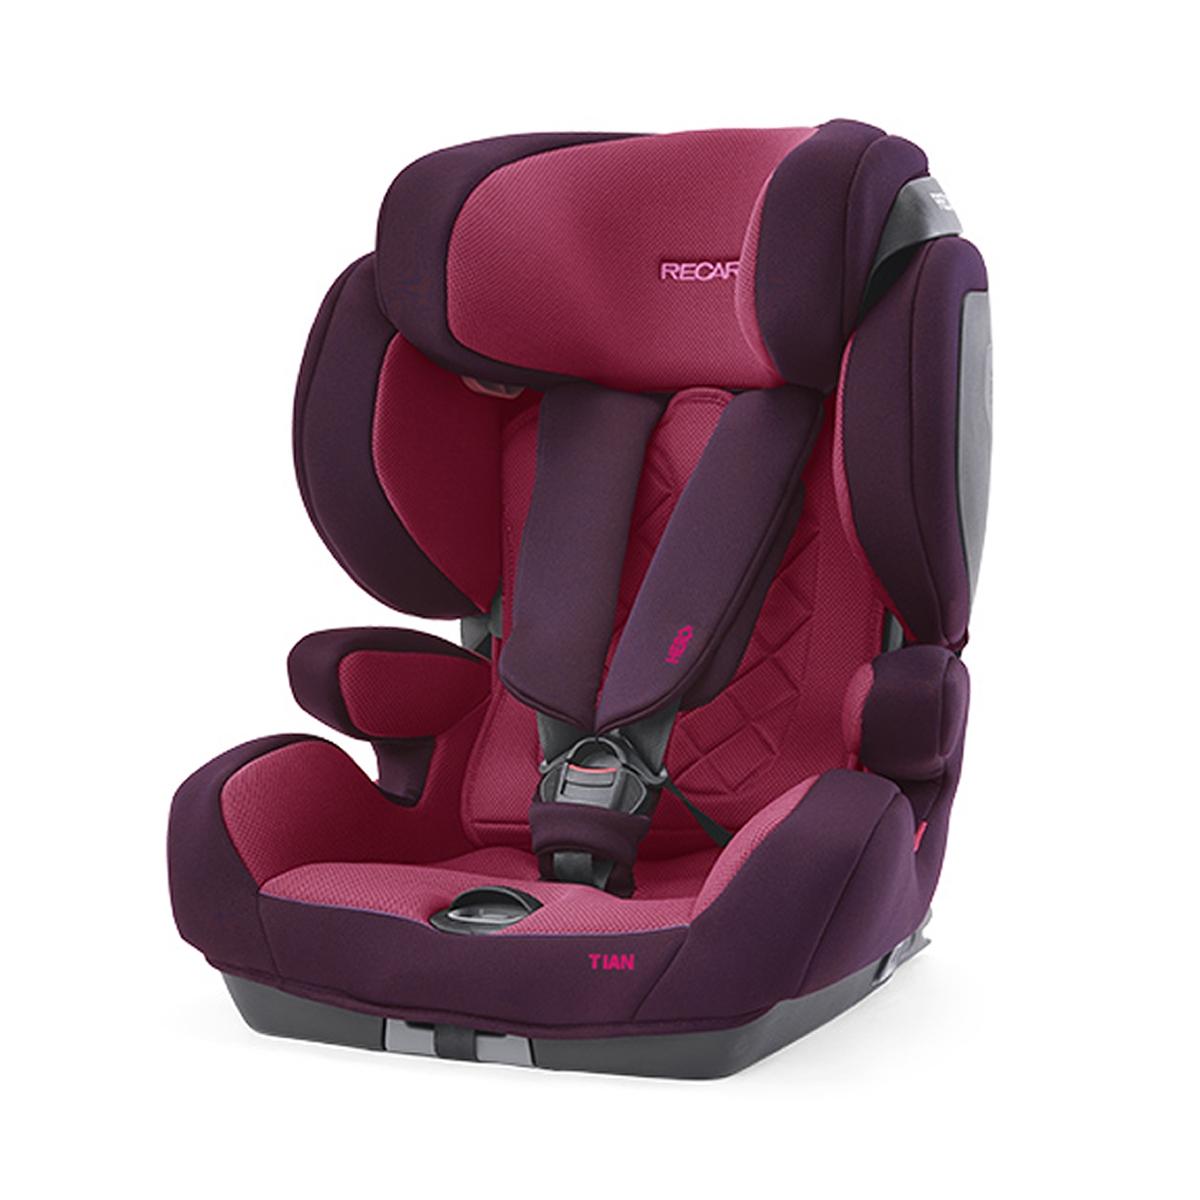 Recaro Tian Core Group 1 Car Seat-Power Berry